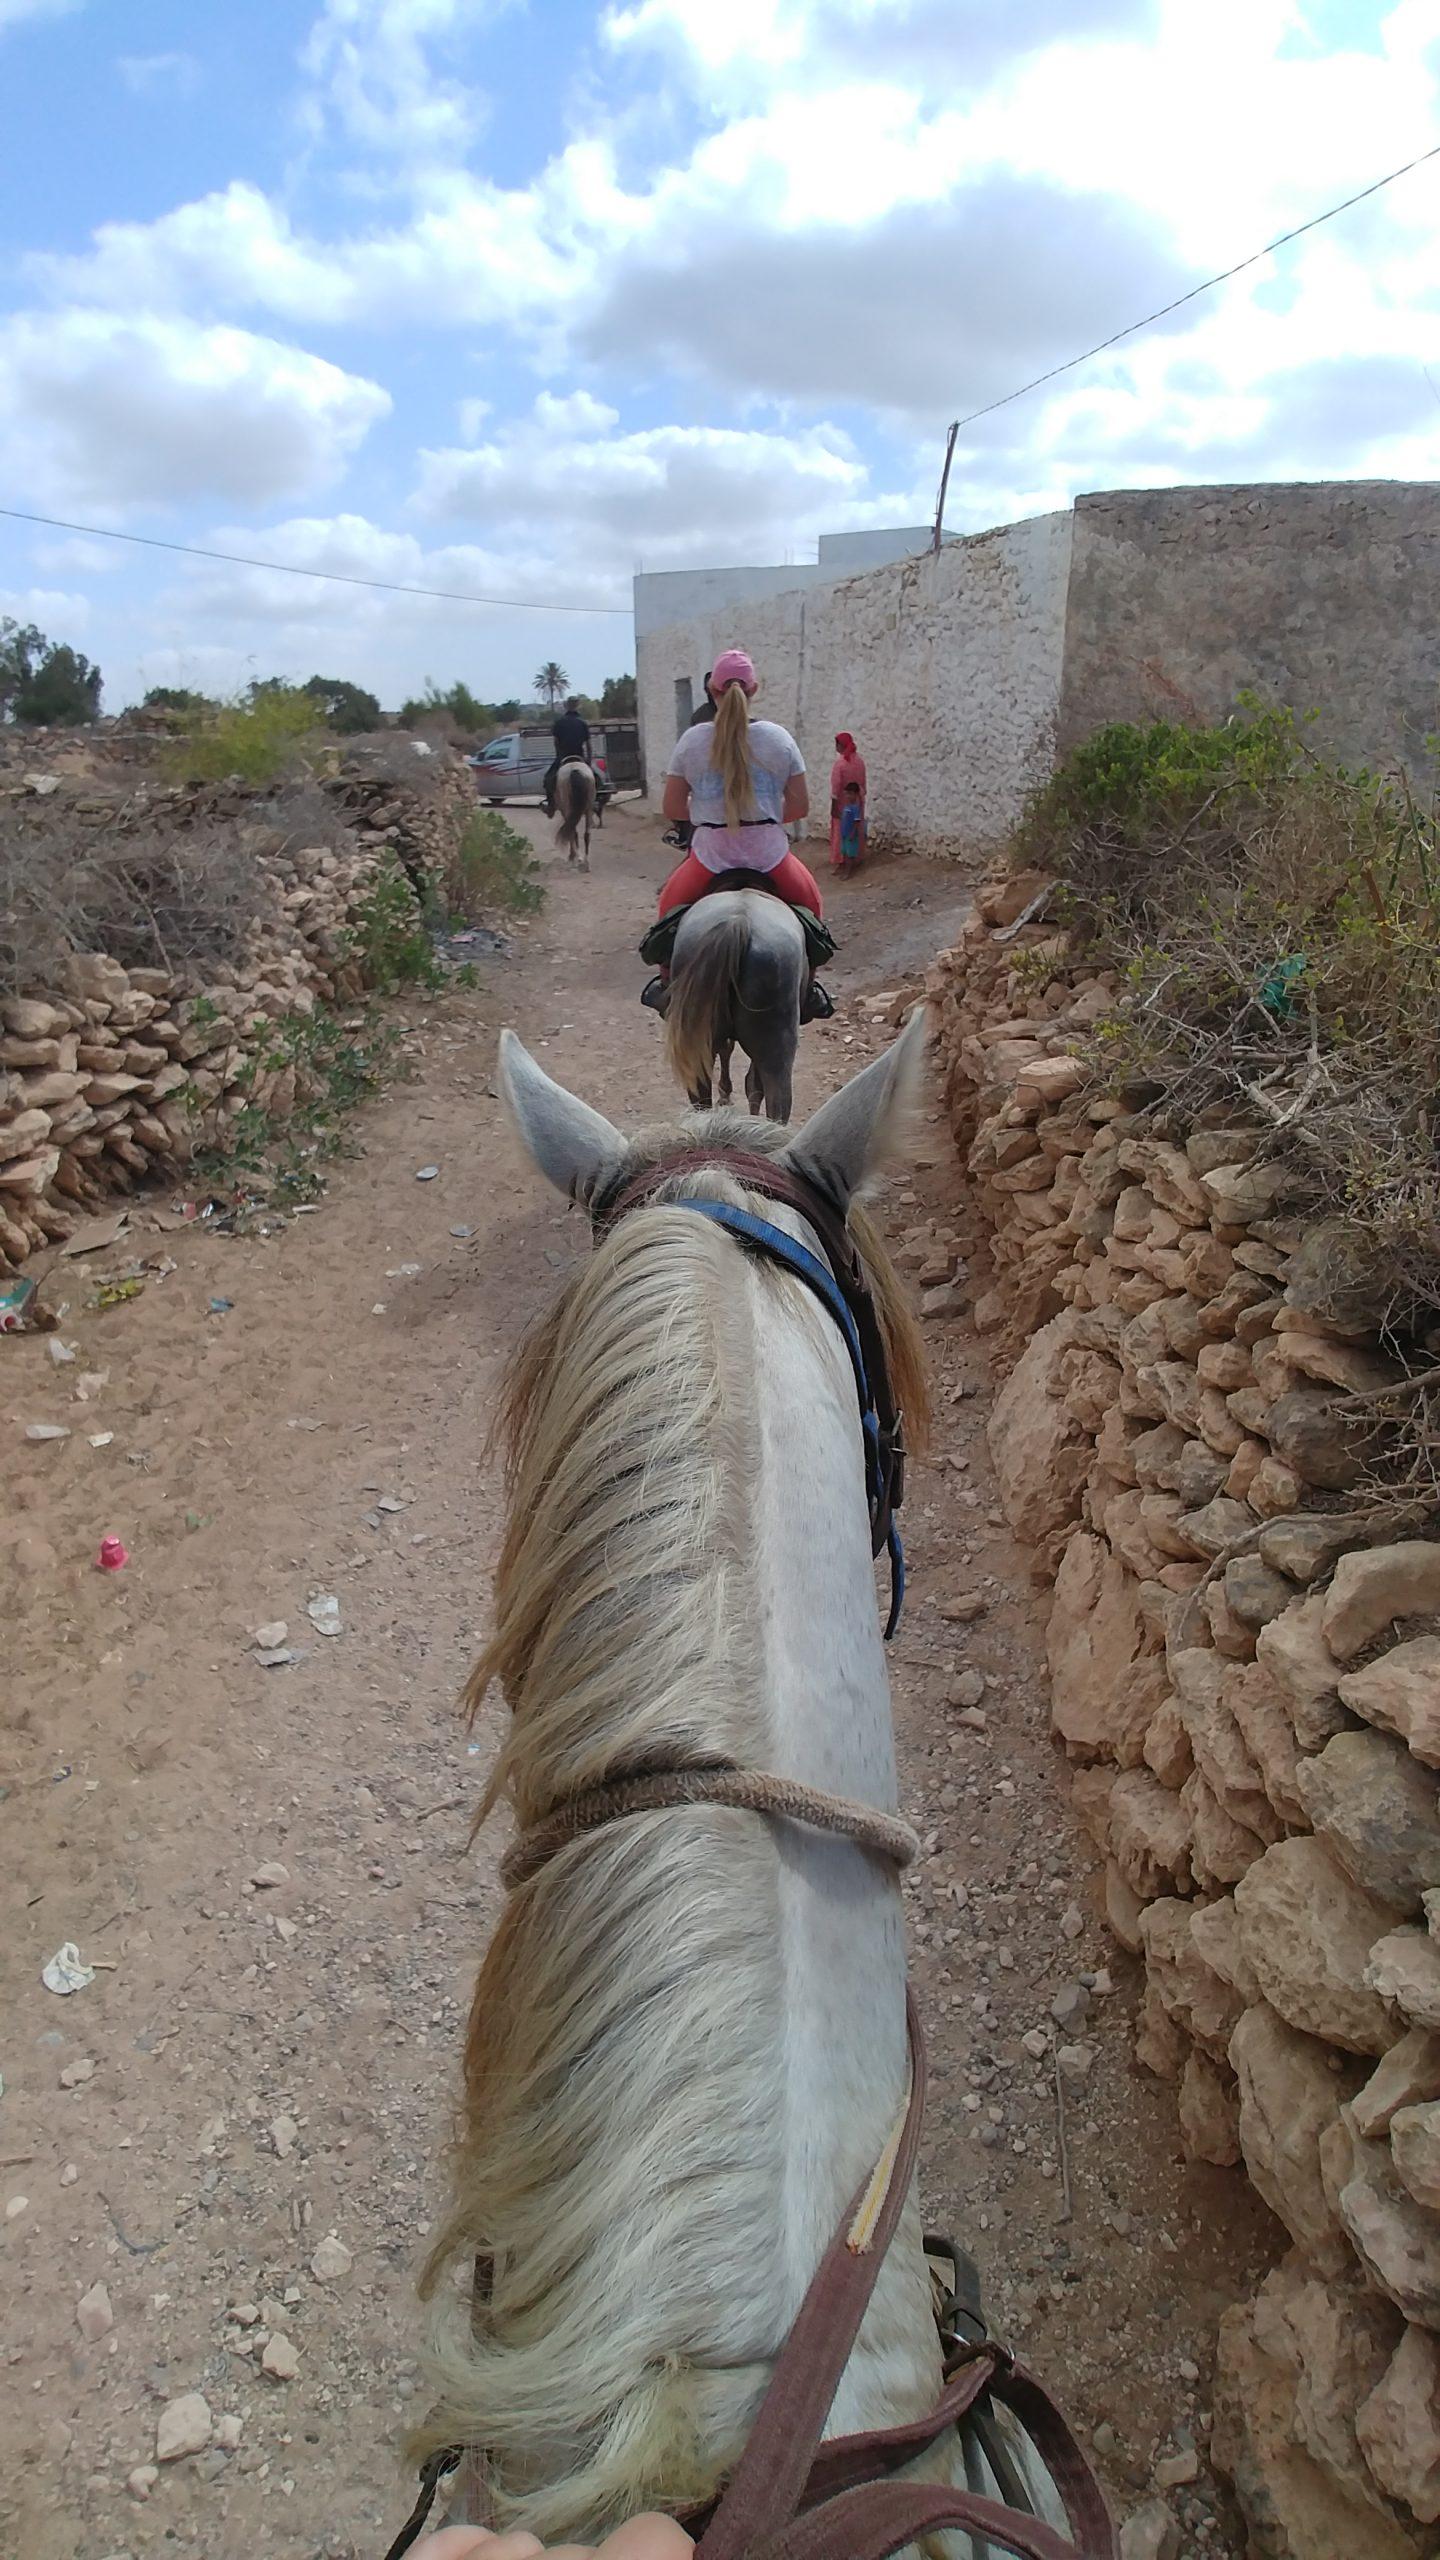 Maroc - Randonnée à cheval à Essaouira et Sidi Kaouki